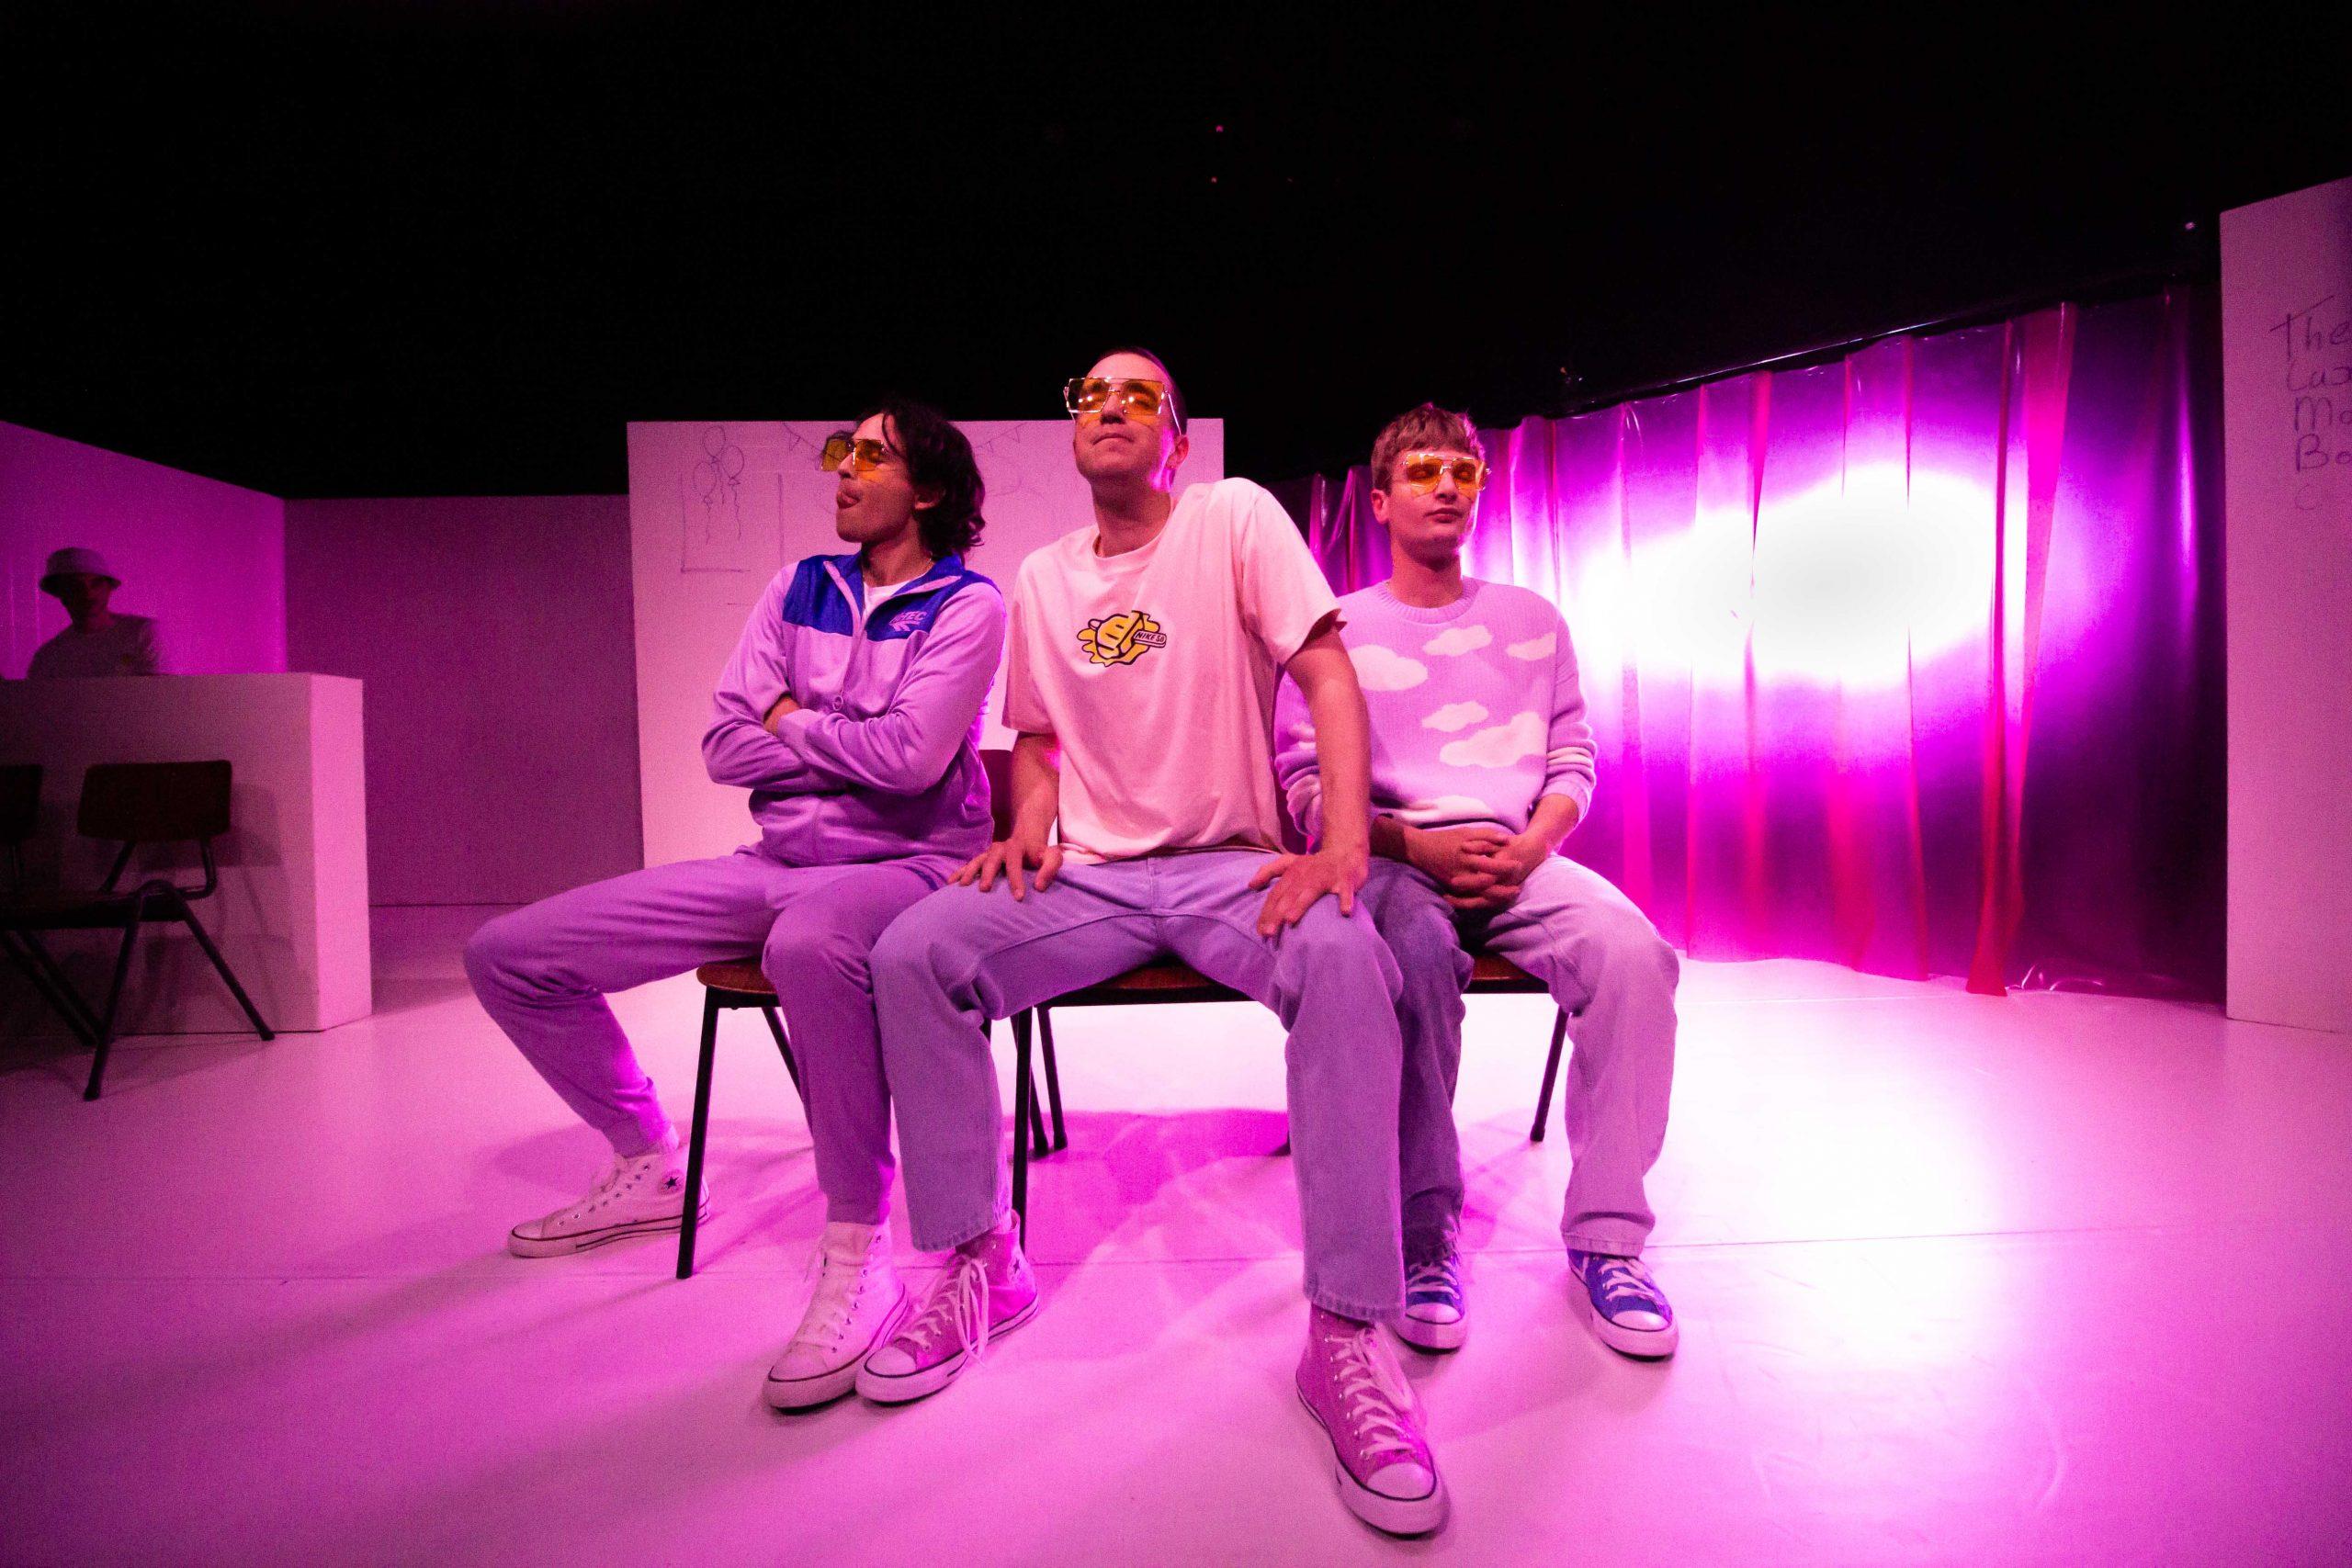 Suicide Sisters - Theater - Eva van Kleef - Abe Dijkman - Sebastiàn Mrkvicka - Arman Rosbak - Acteur - Het Laagland - Viazuid - toneelacademie maastricht